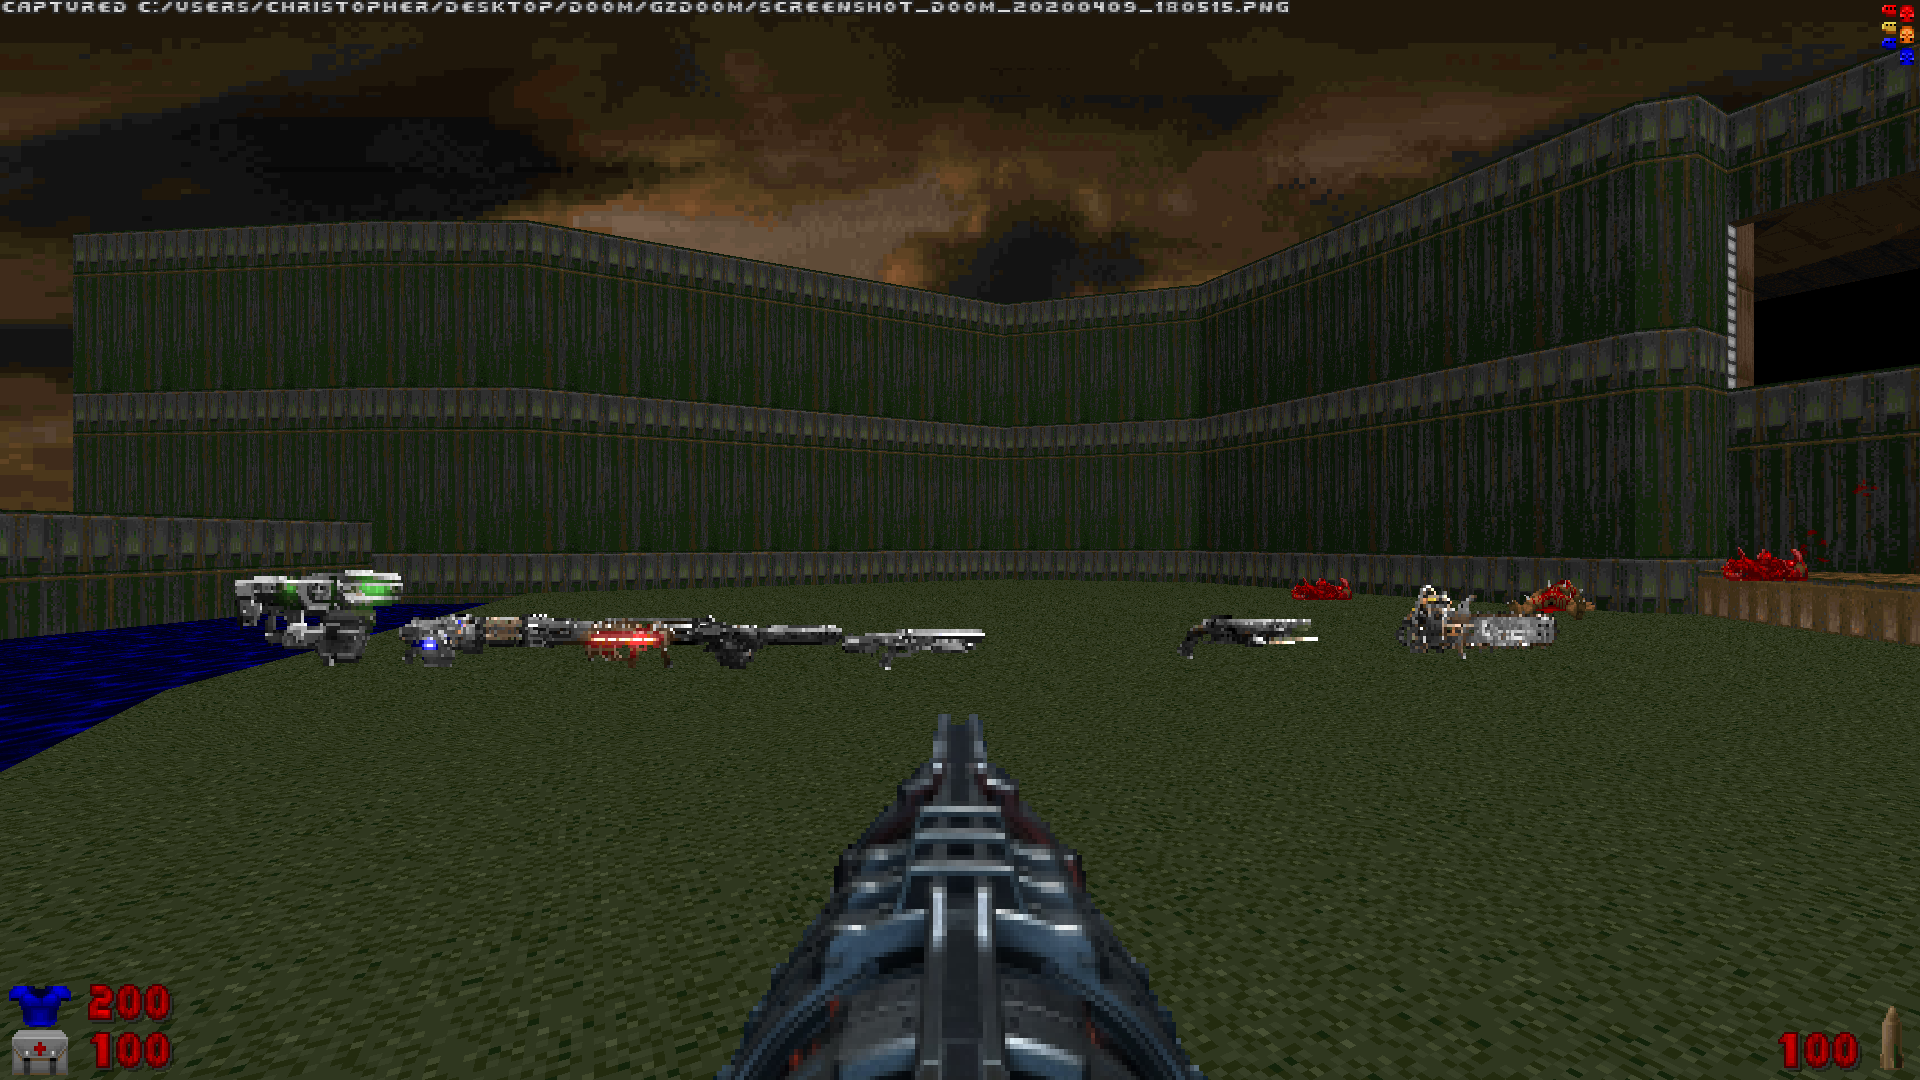 Screenshot_Doom_20200409_180517.png.24756dd4127aa122136c6b79bb37ccdf.png